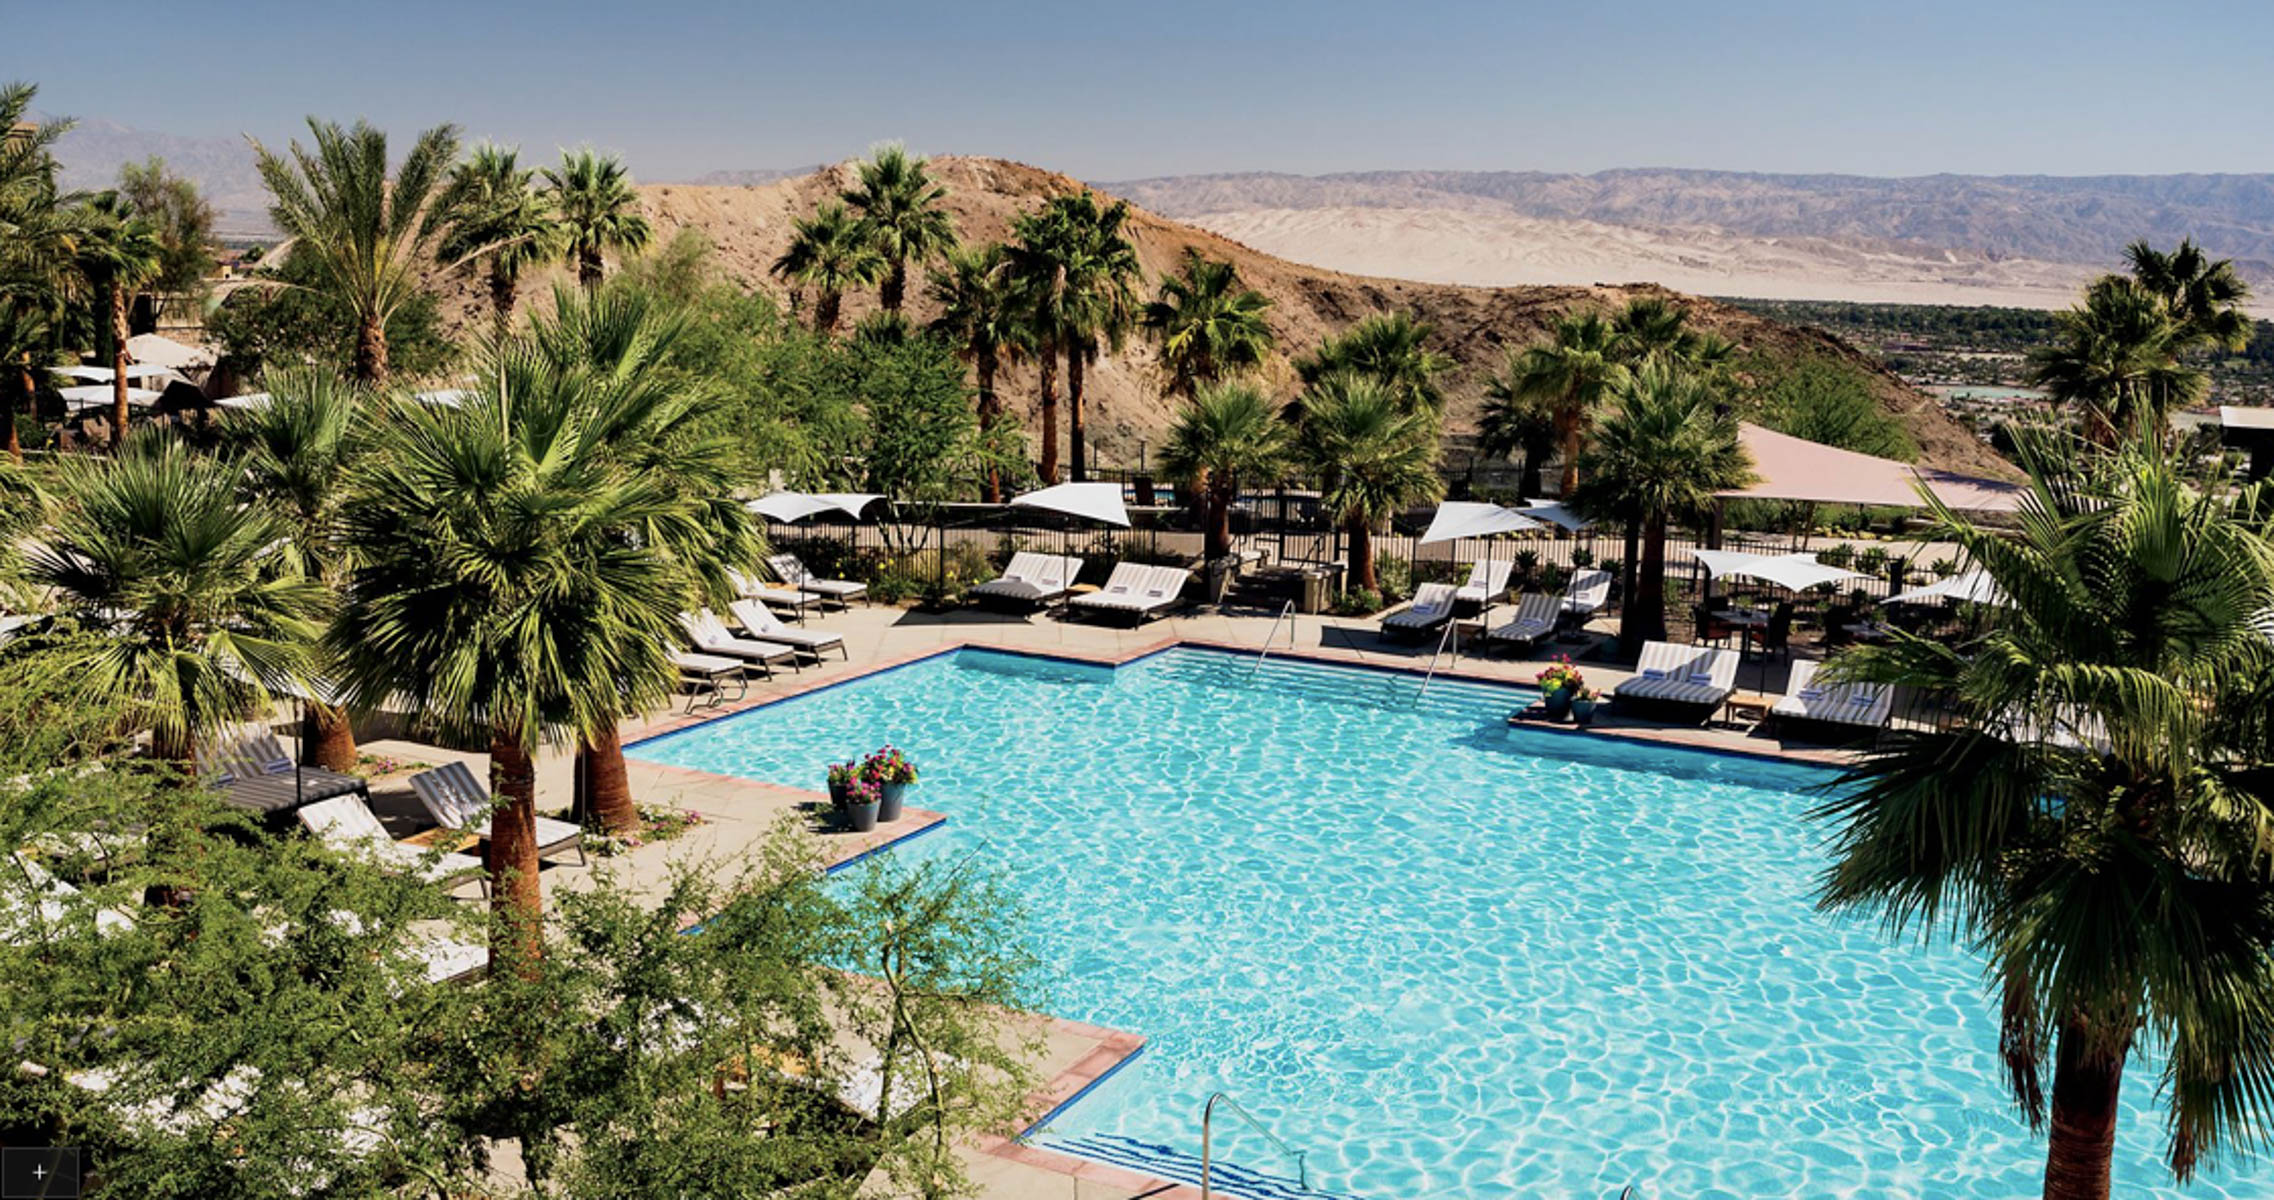 Best Palm Desert Travel Ideas_Palm Desert Hotels_Palm Desert_resorts_Addie Bell-21.jpg